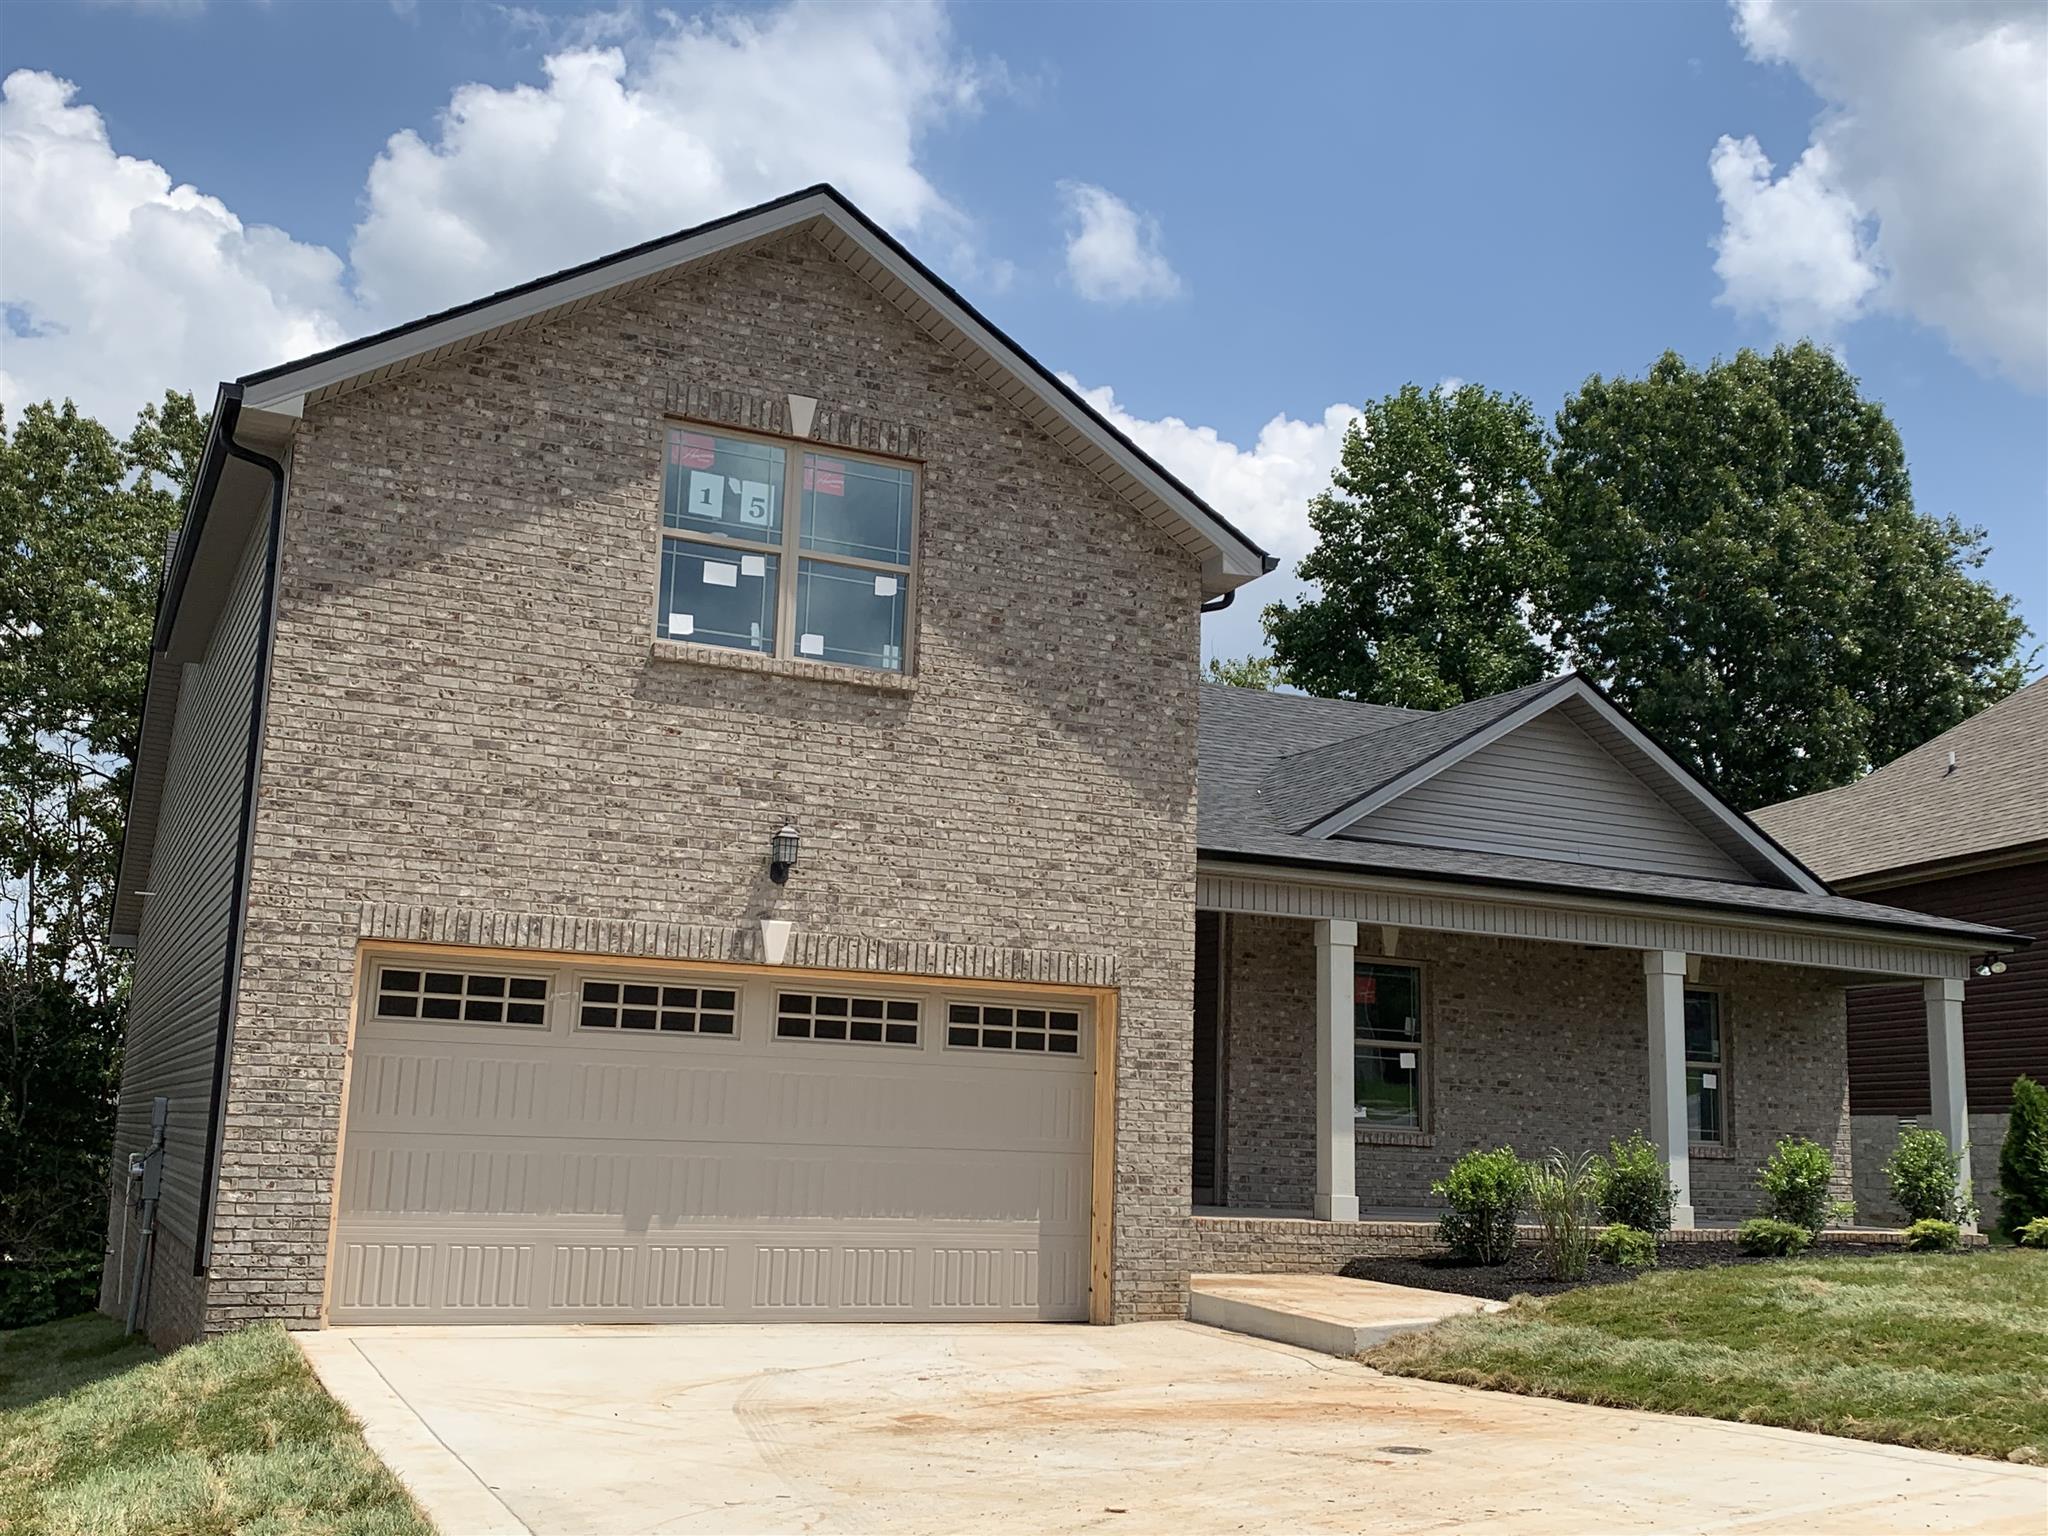 145 Camelot Hills Lot 145, Clarksville, TN 37040 - Clarksville, TN real estate listing